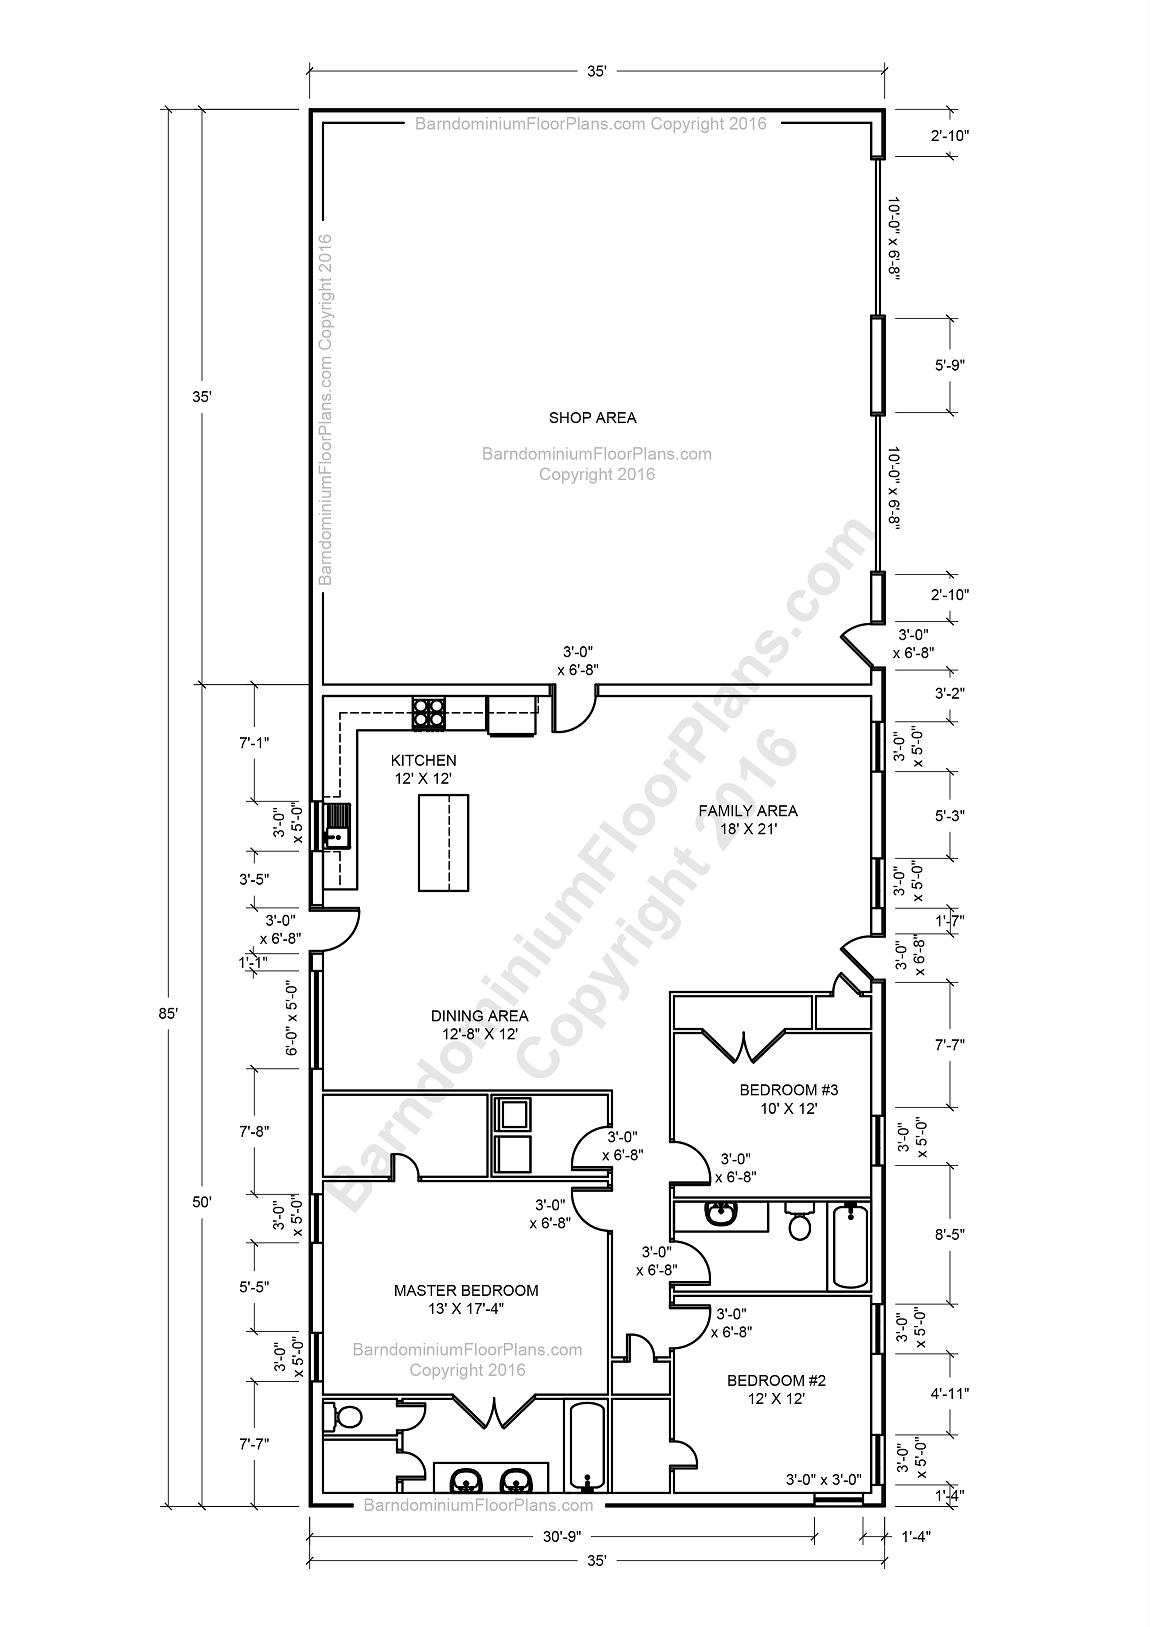 barndominium floor plans 2 story 4 bedroom with shop barndominium floor plans cost open concept small with garage metal buildings barn houses  [ 1150 x 1627 Pixel ]